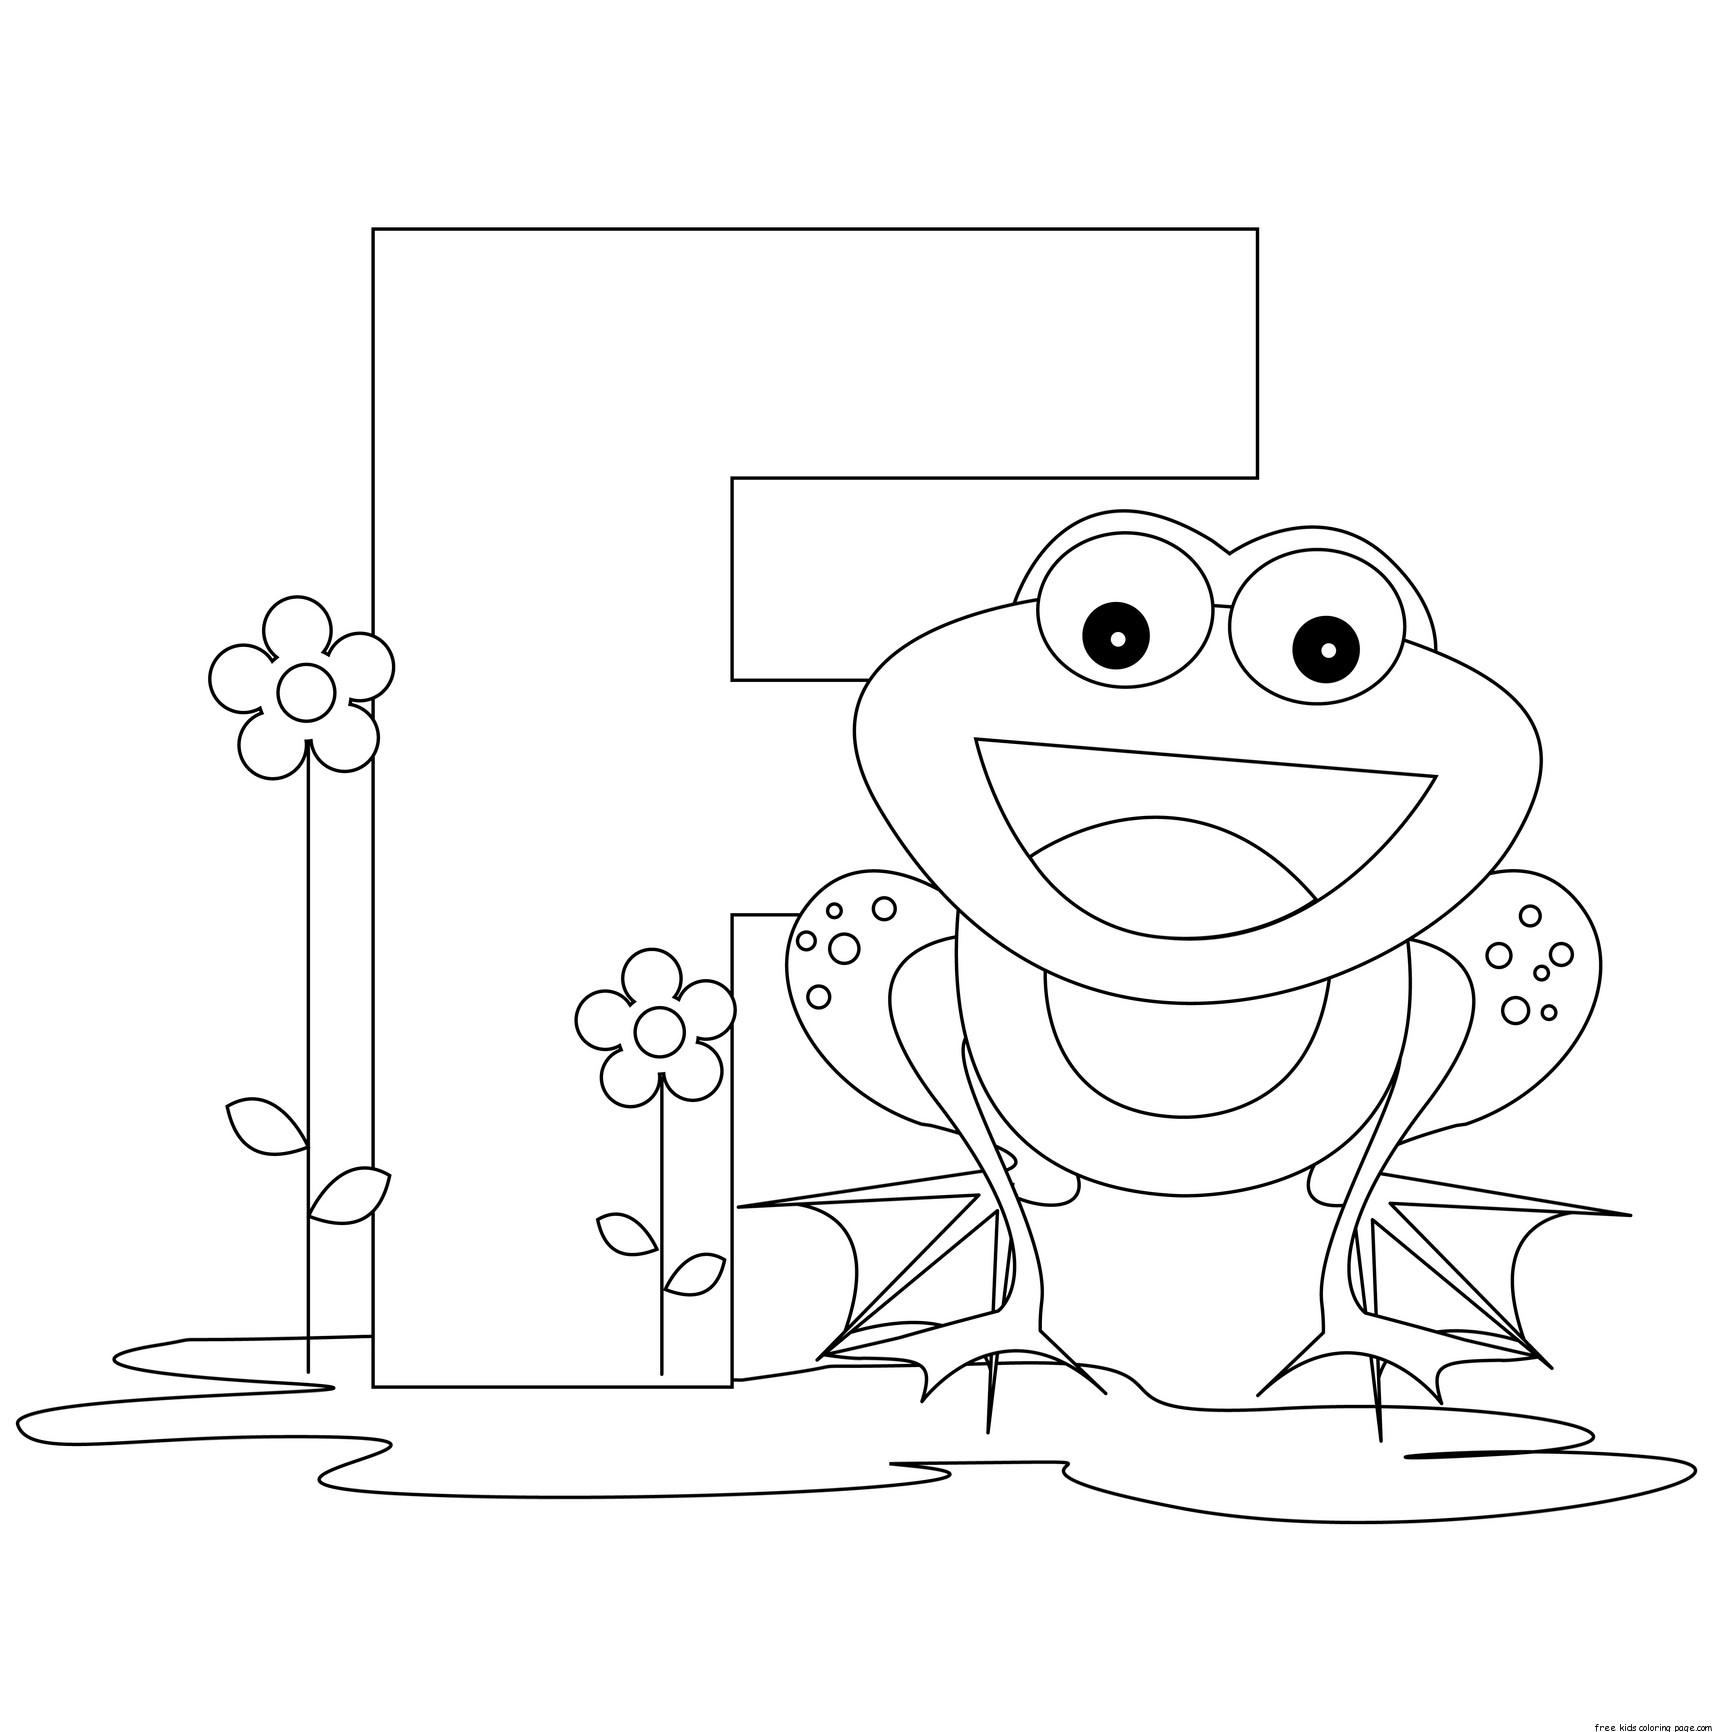 animal alphabet colouring pages animal alphabet q coloring page stock vector pages colouring animal alphabet